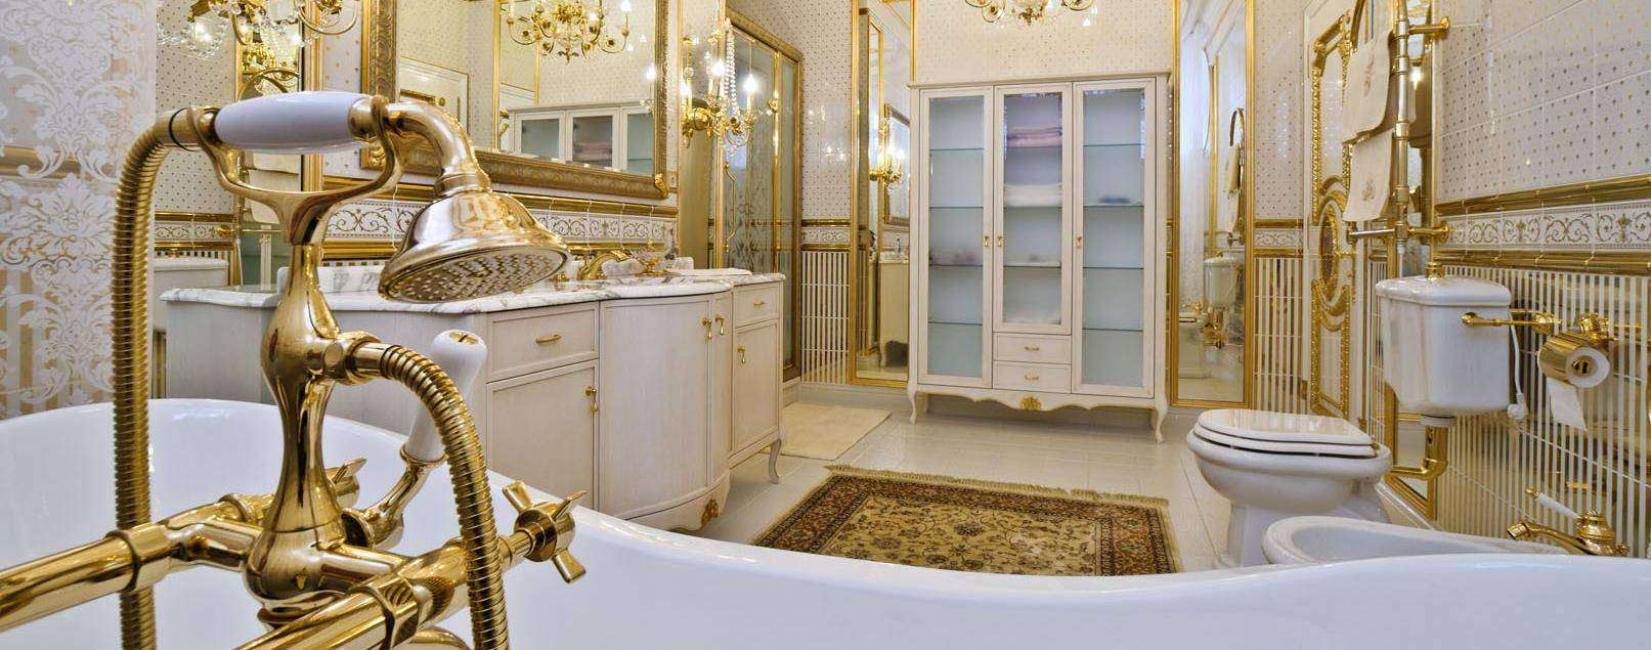 Ванная в золоте - красиво и богато